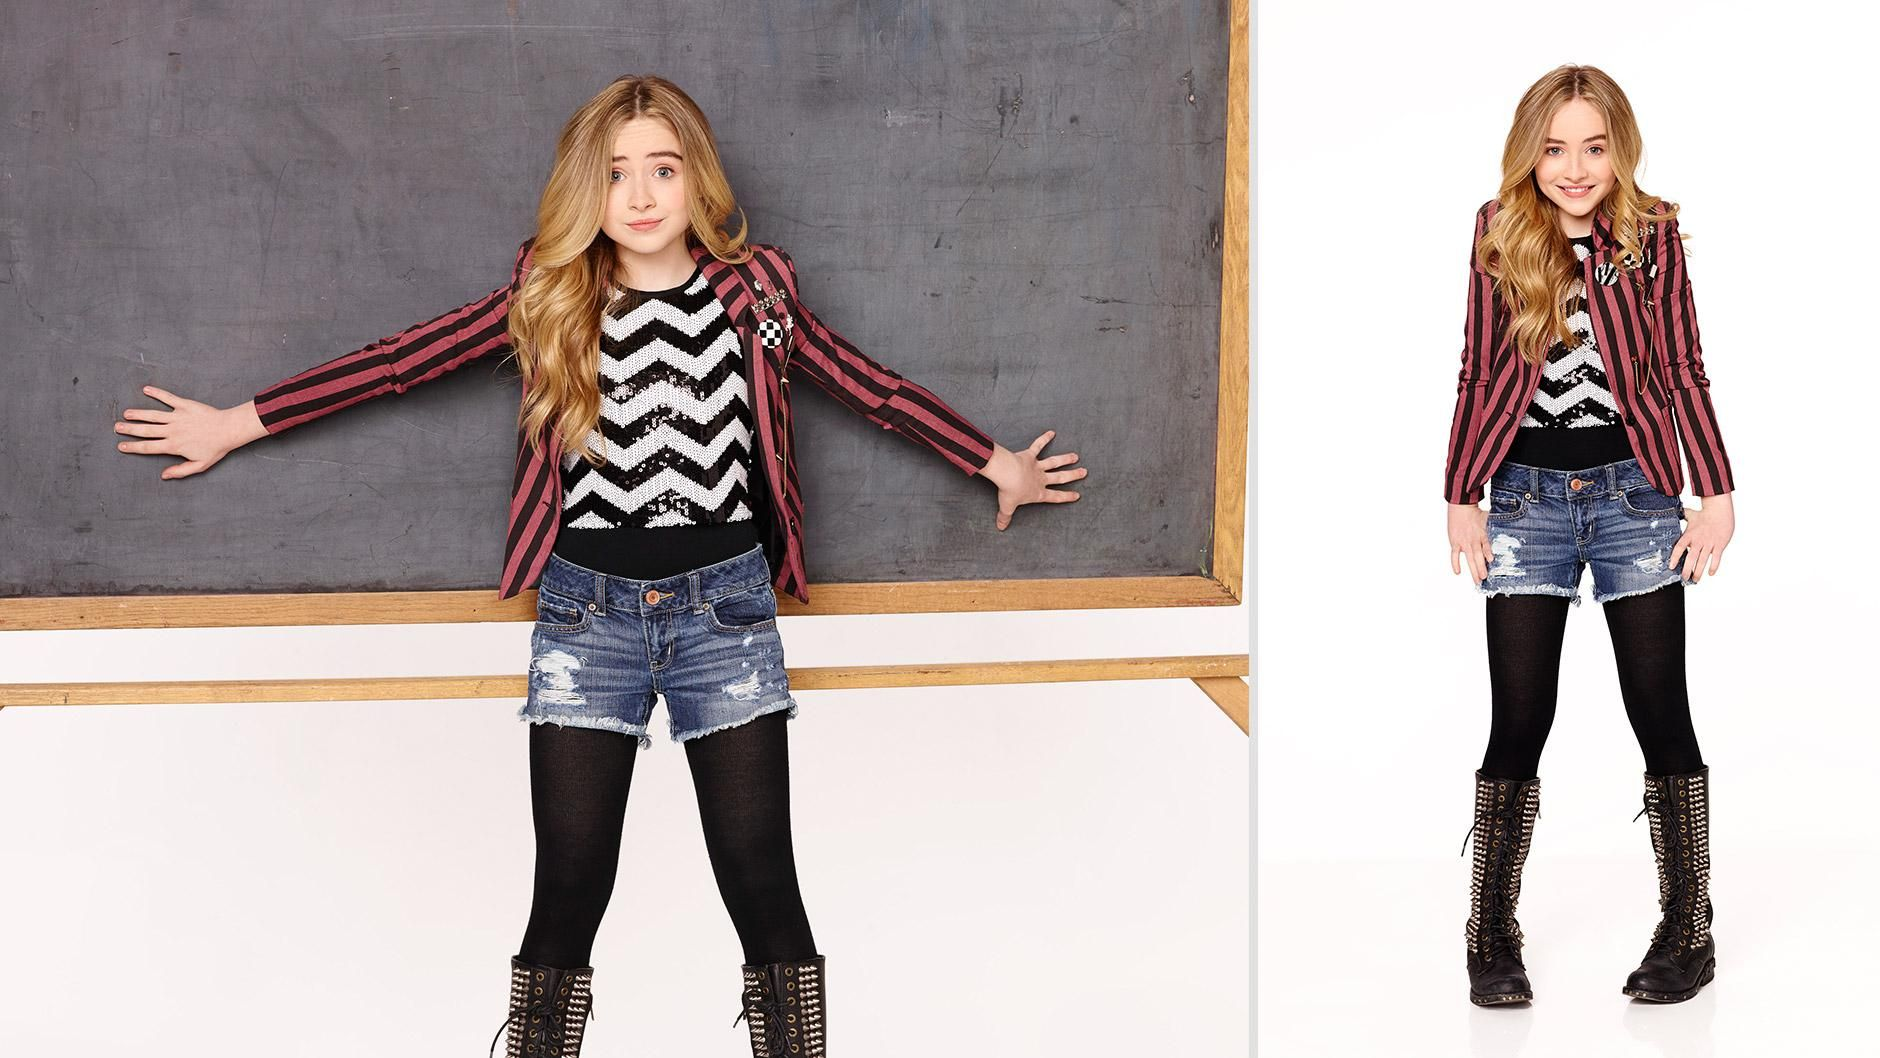 costume ref:  Girl Meets World   Disney Channel UK